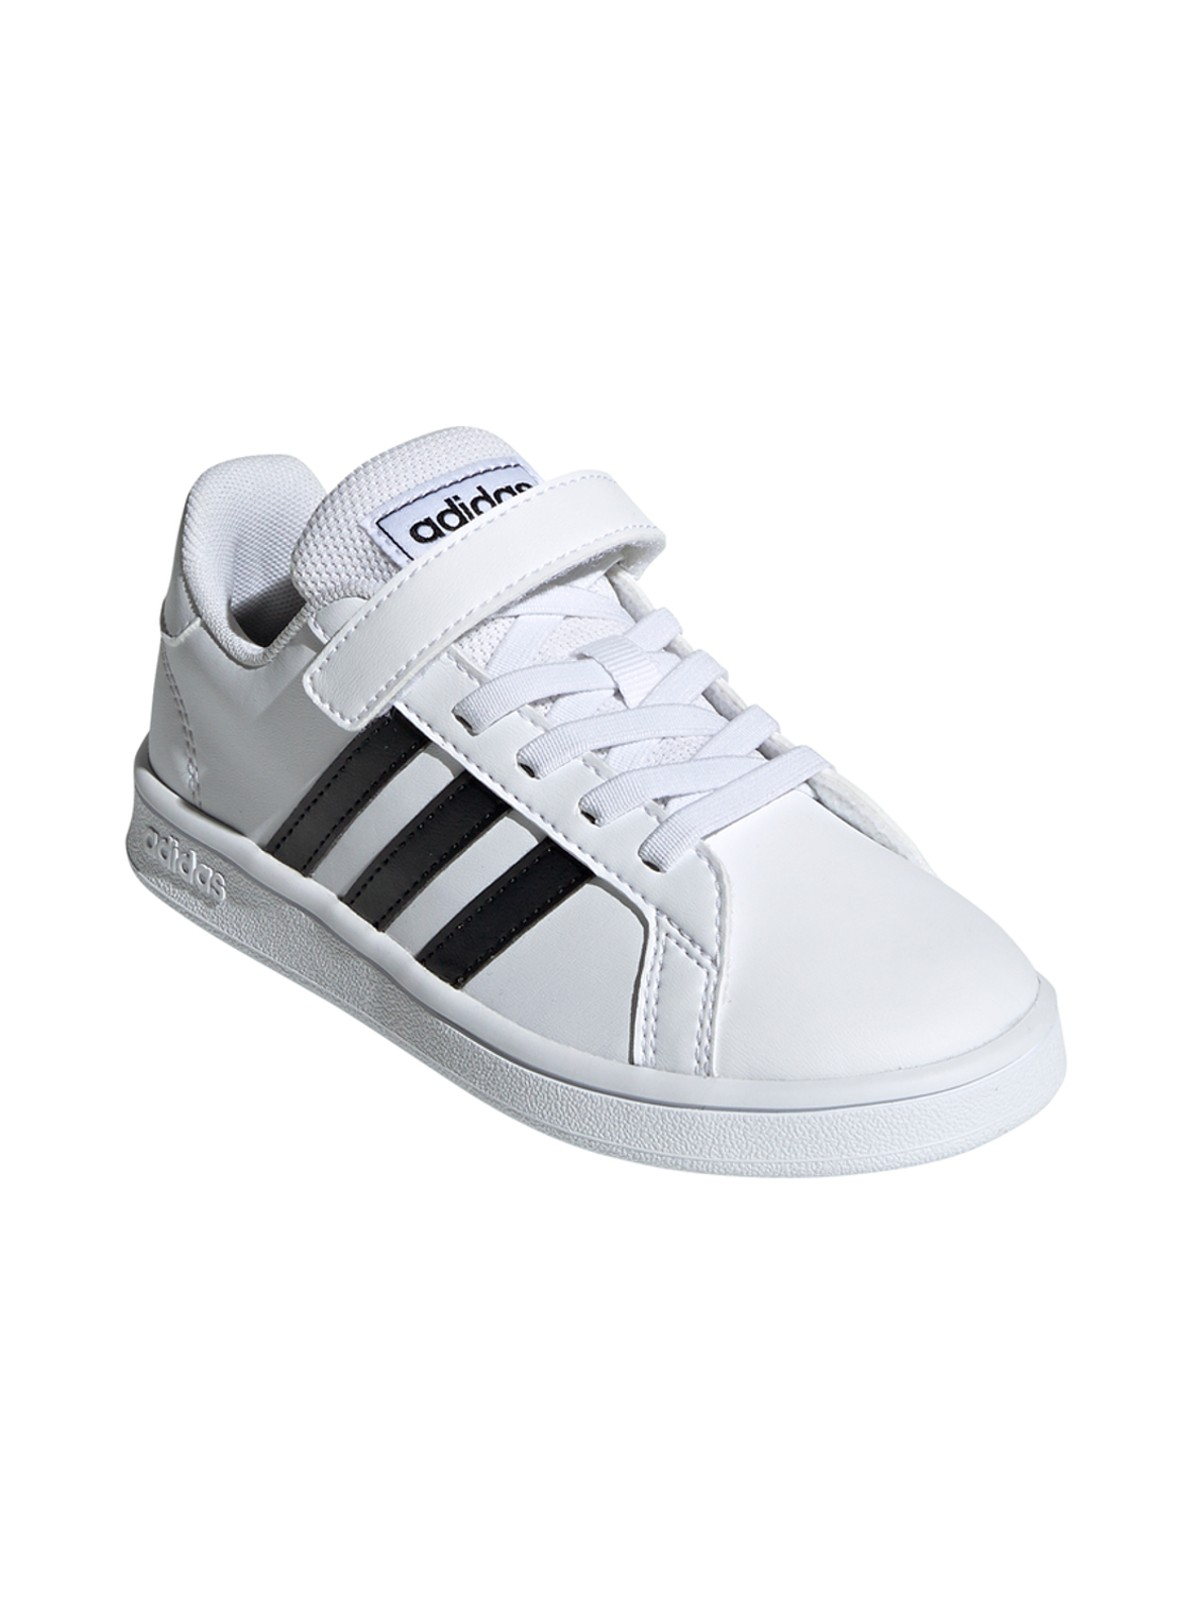 chaussure adidas enfant garçon 28